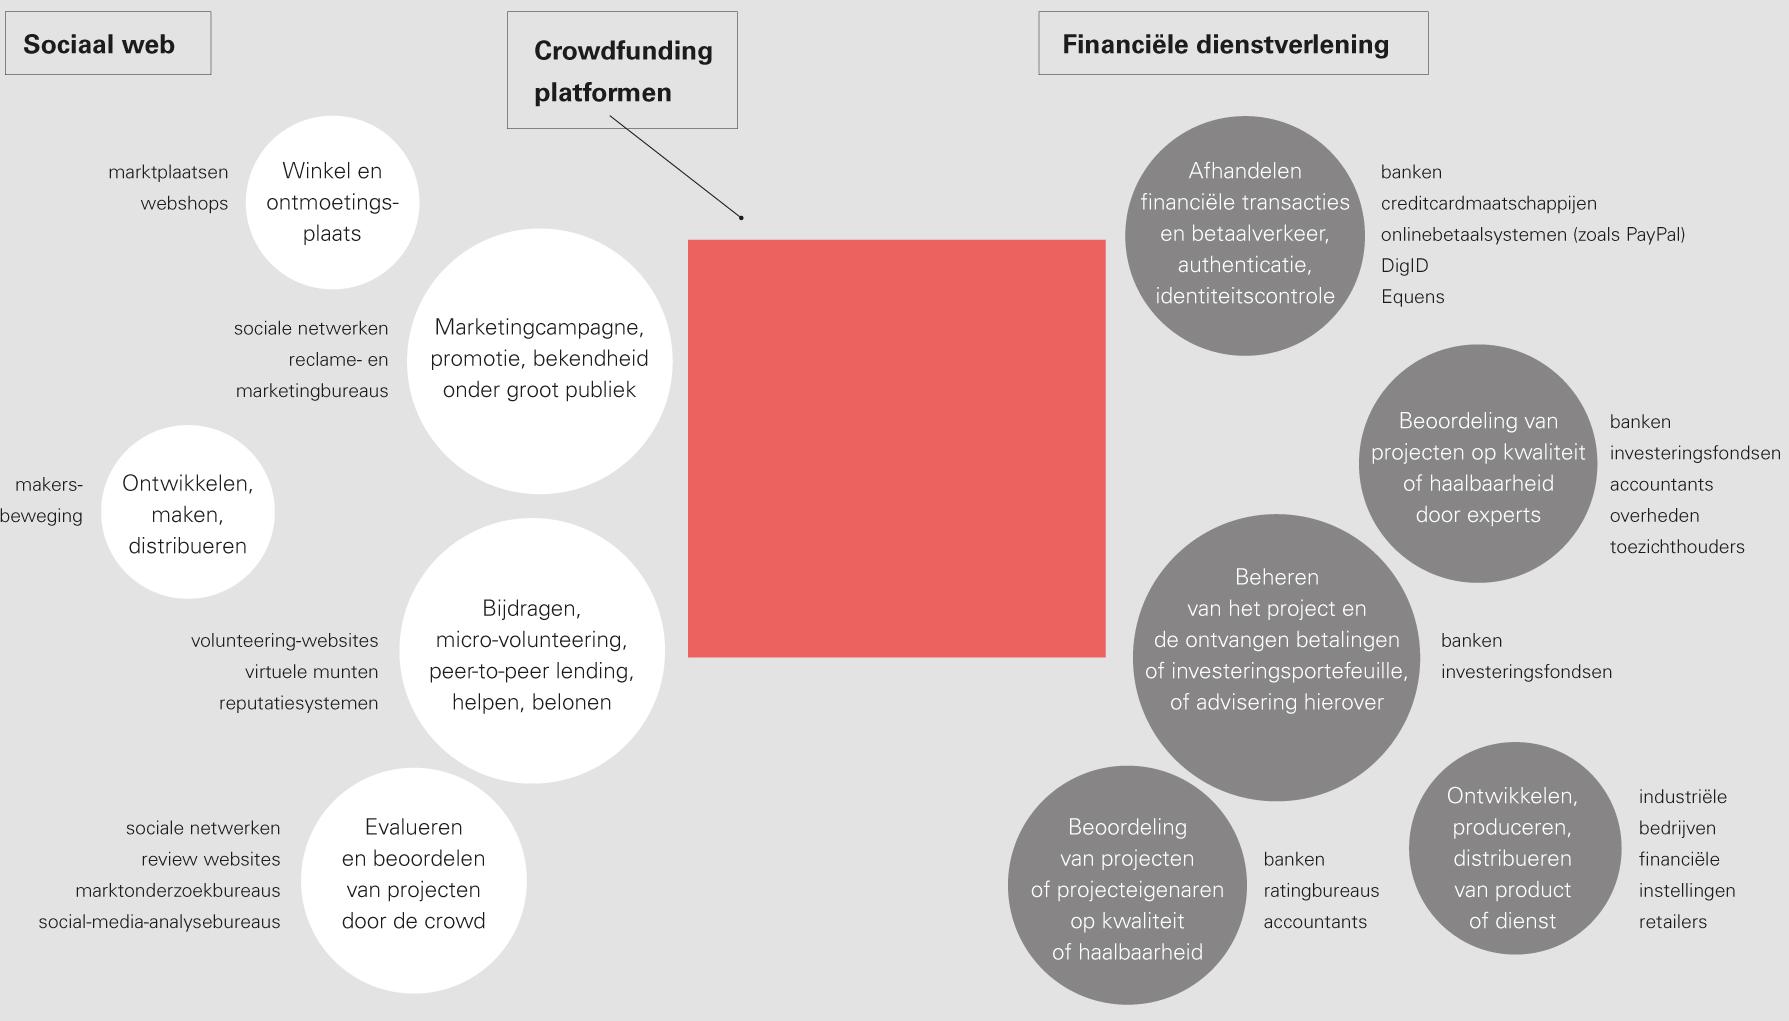 Crowdfunding evolution